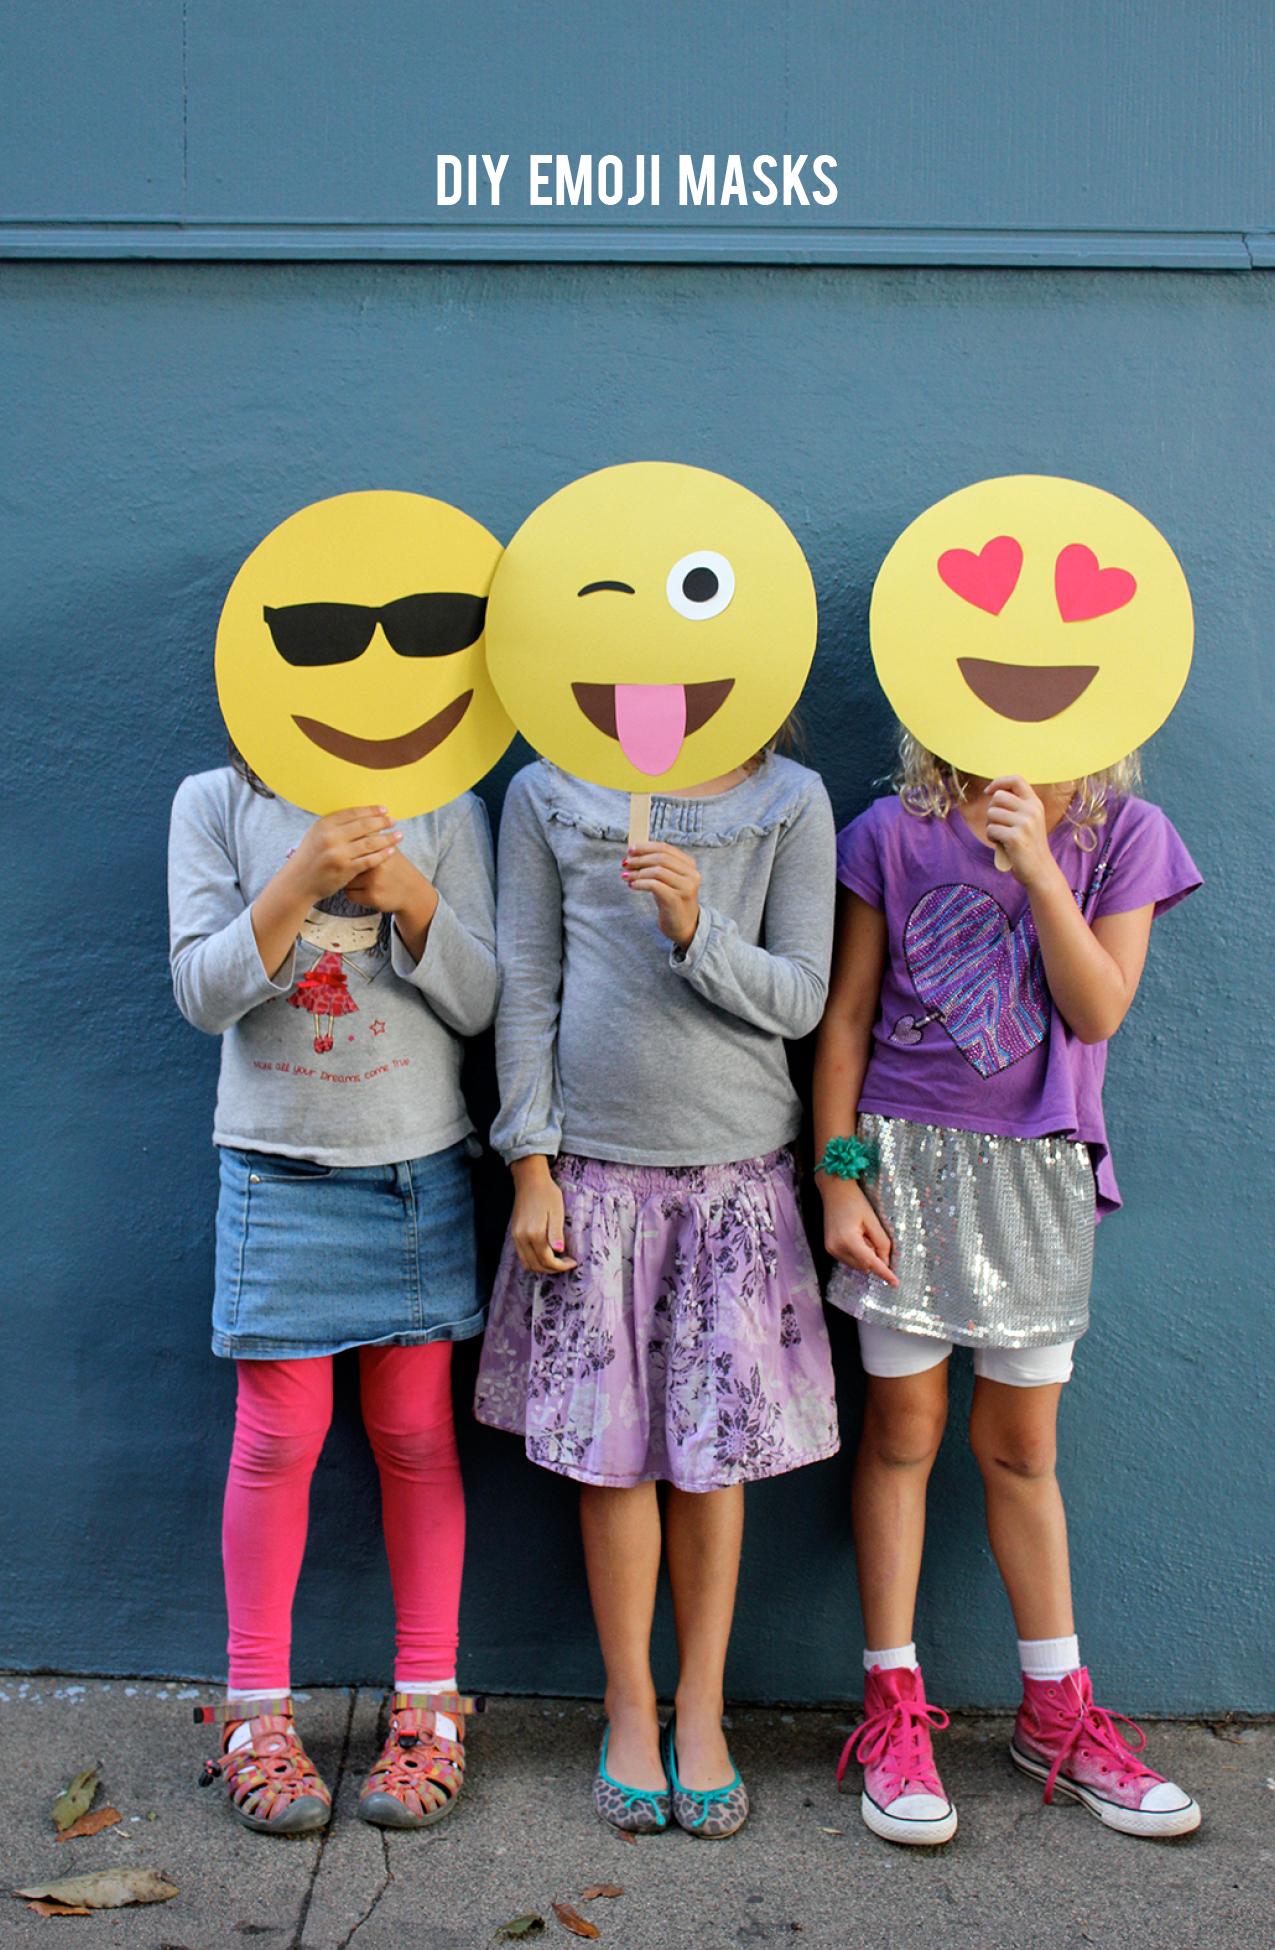 Emoji party photobooth props: DIY Emoji Masks | Alice and Lois